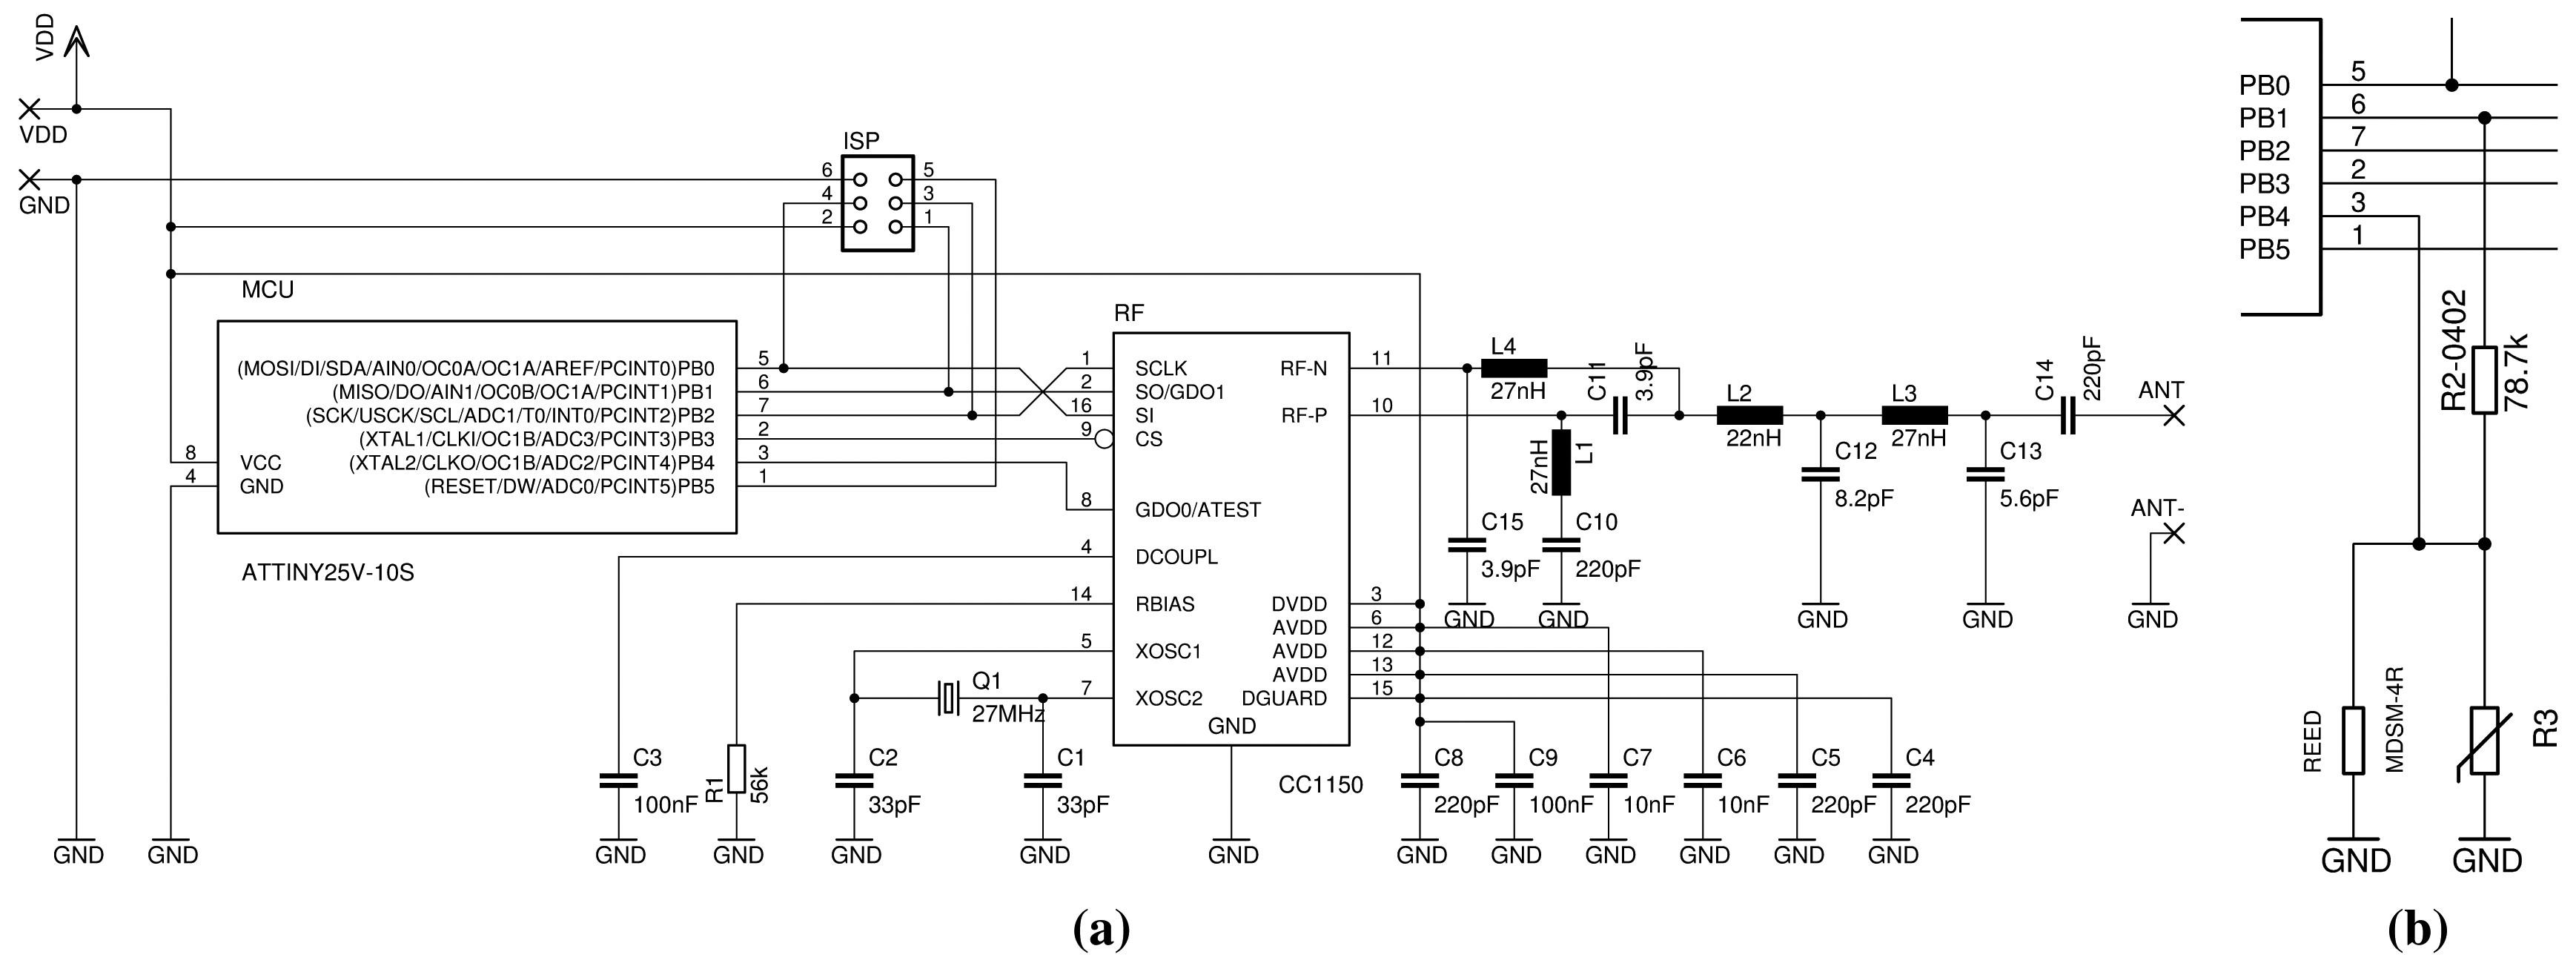 Kib Micro Monitor Panel Instructions Ks 3989] Kib Monitor Wiring Diagram Free Diagram Of Kib Micro Monitor Panel Instructions